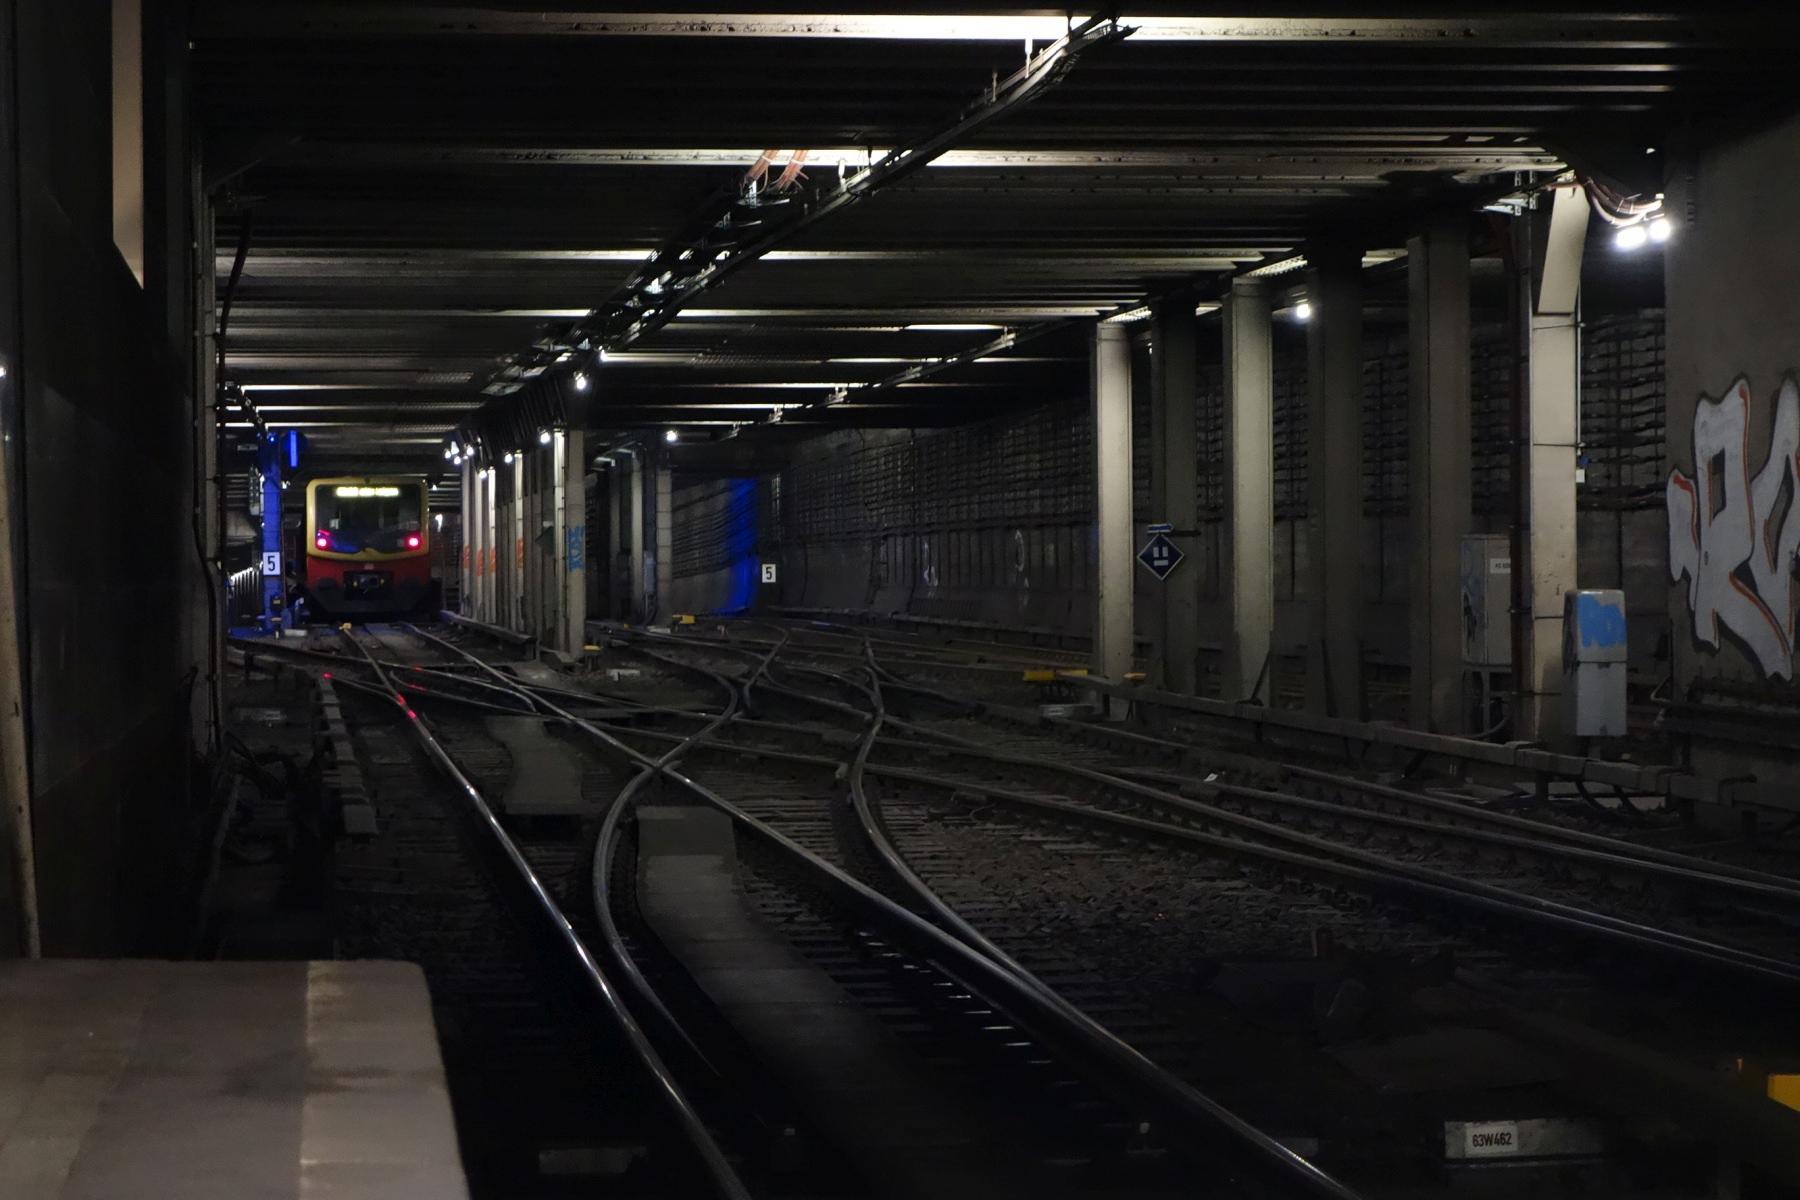 Kehranlage S-Bahn Berlin Nord-Süd-Tunnel Potsdamer Platz Heuboden